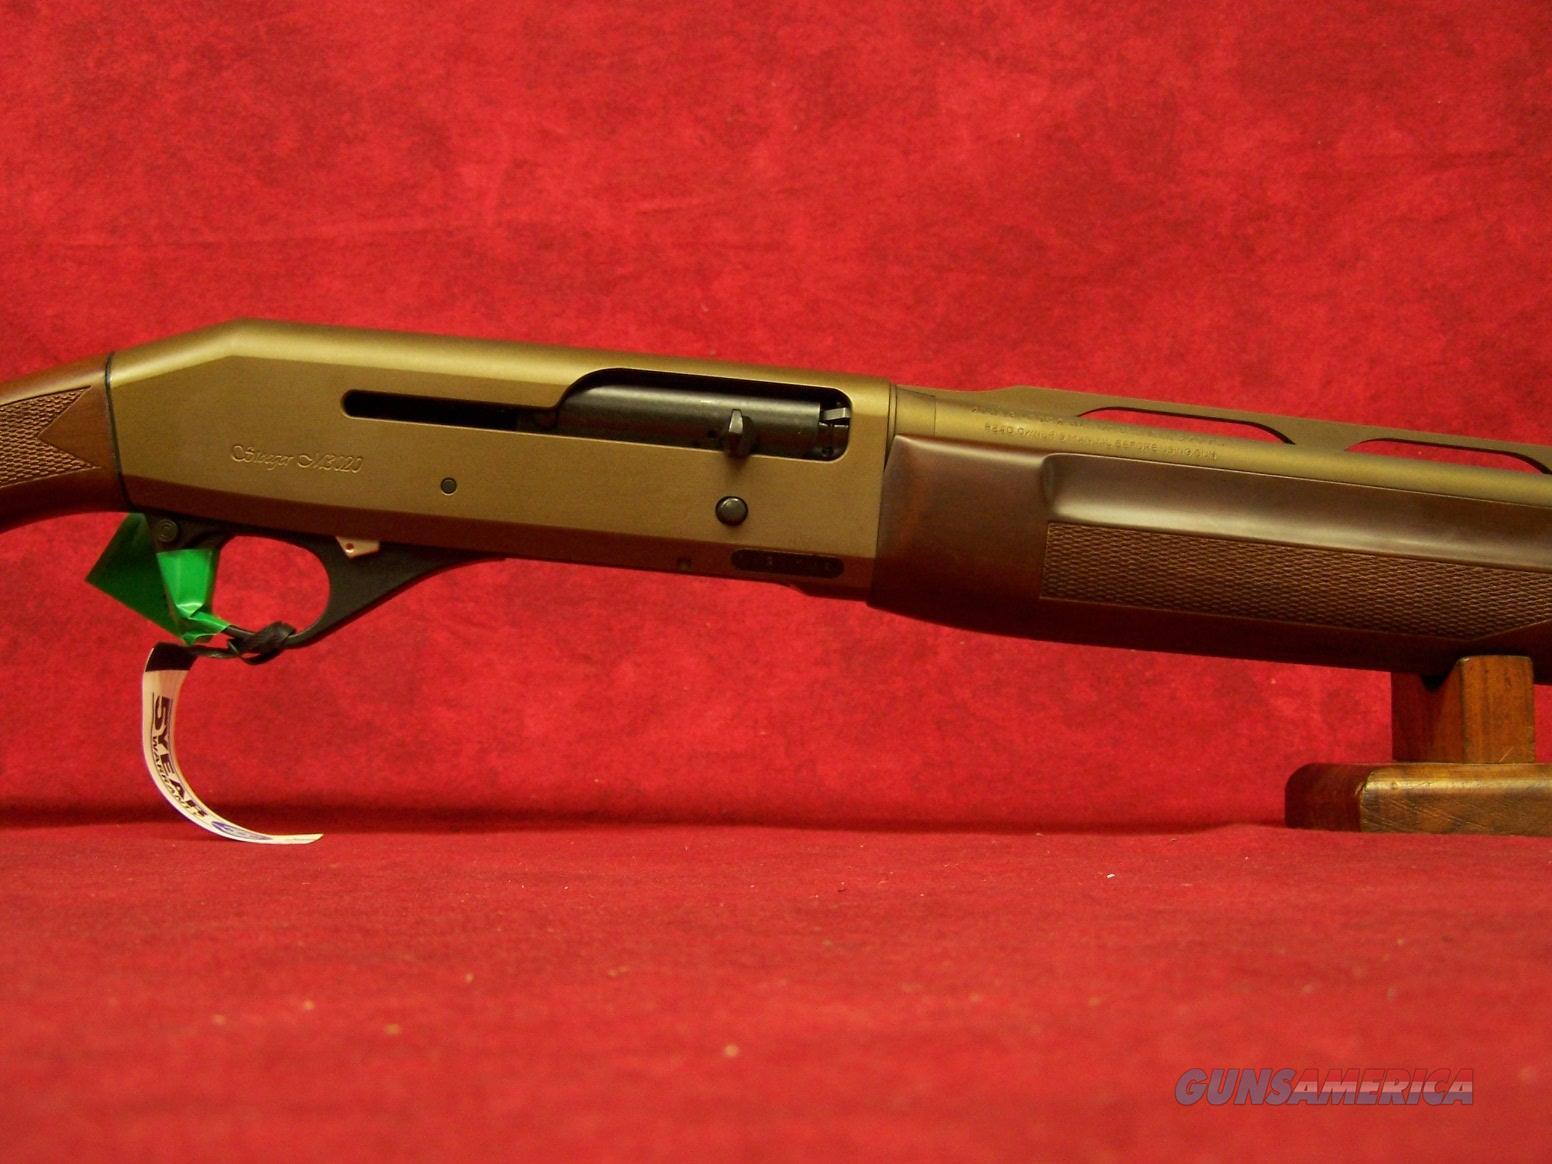 "Stoeger M3020 Walnut Bronze 20ga 3"" Barrel 28"" (31932)  Guns > Shotguns > Stoeger Shotguns"